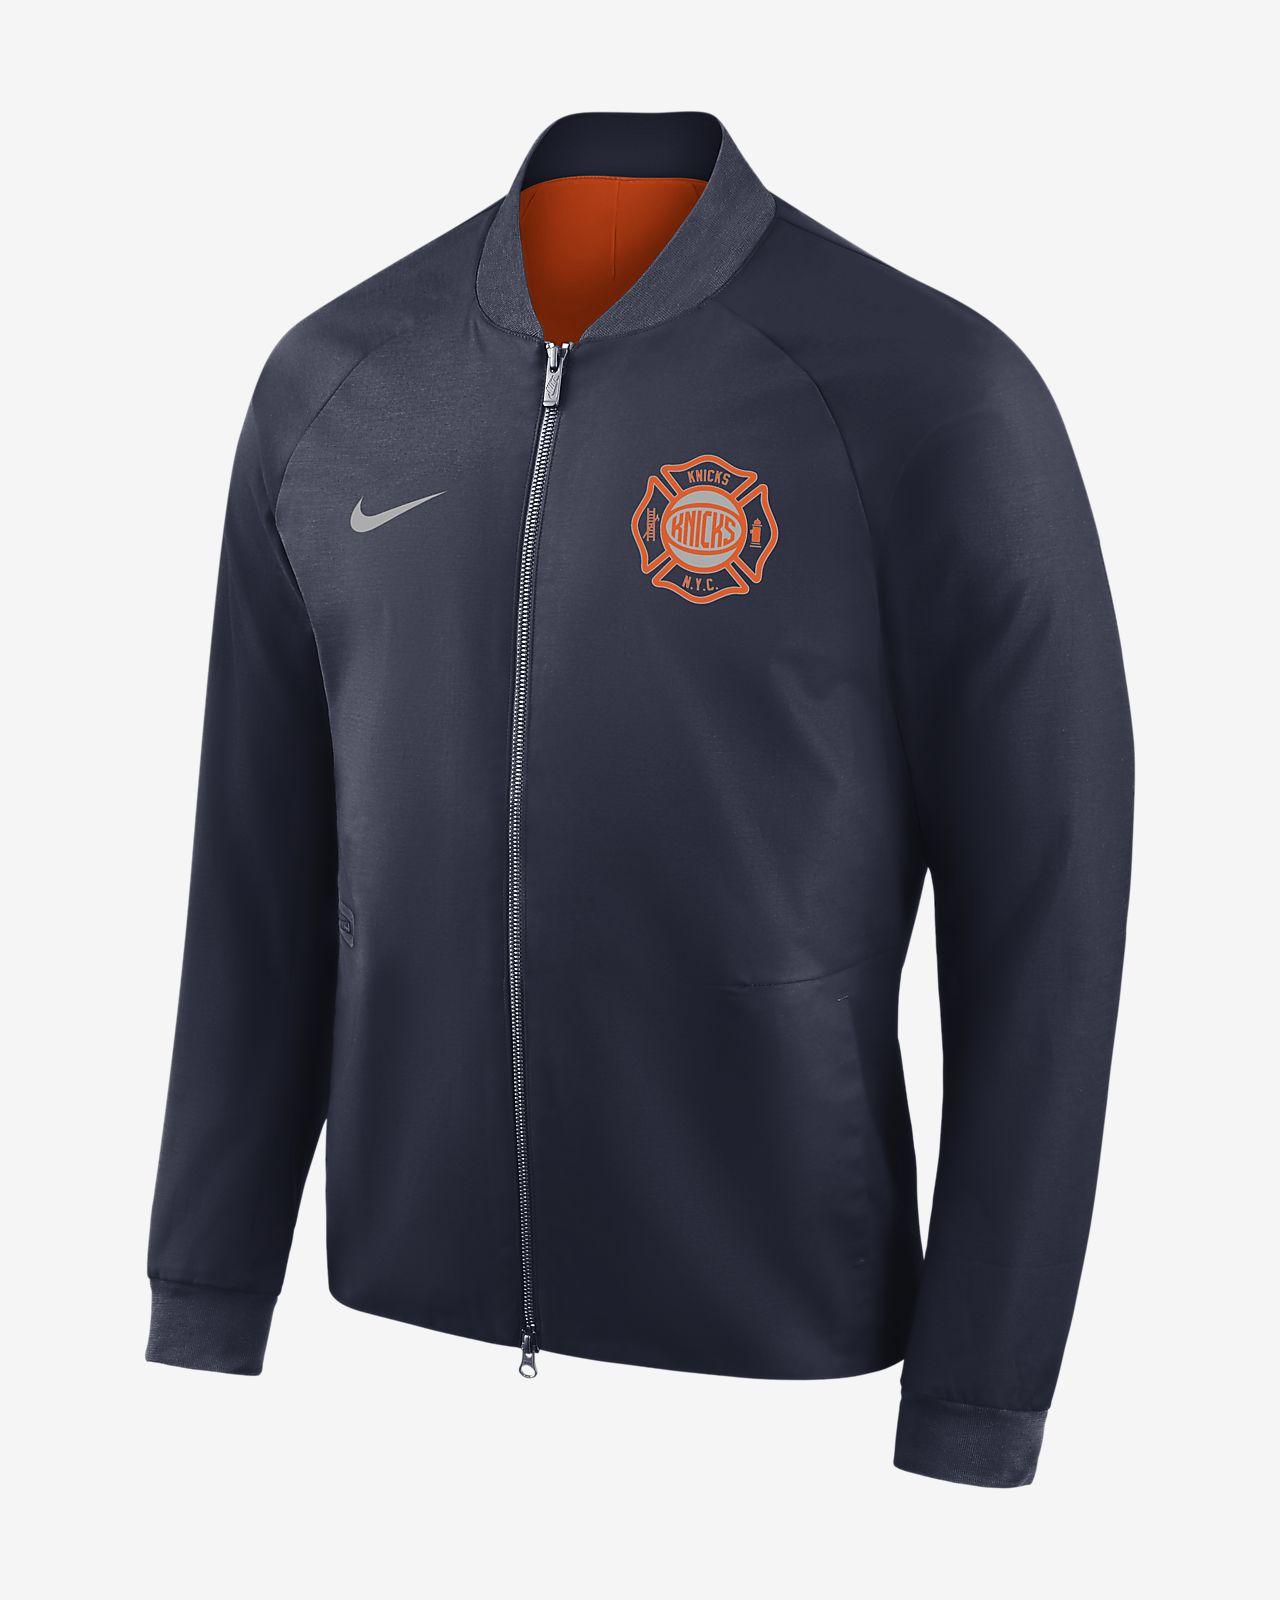 sale retailer 789eb 5c39e Veste universitaire NBA New York Knicks City Edition Nike Modern pour Homme